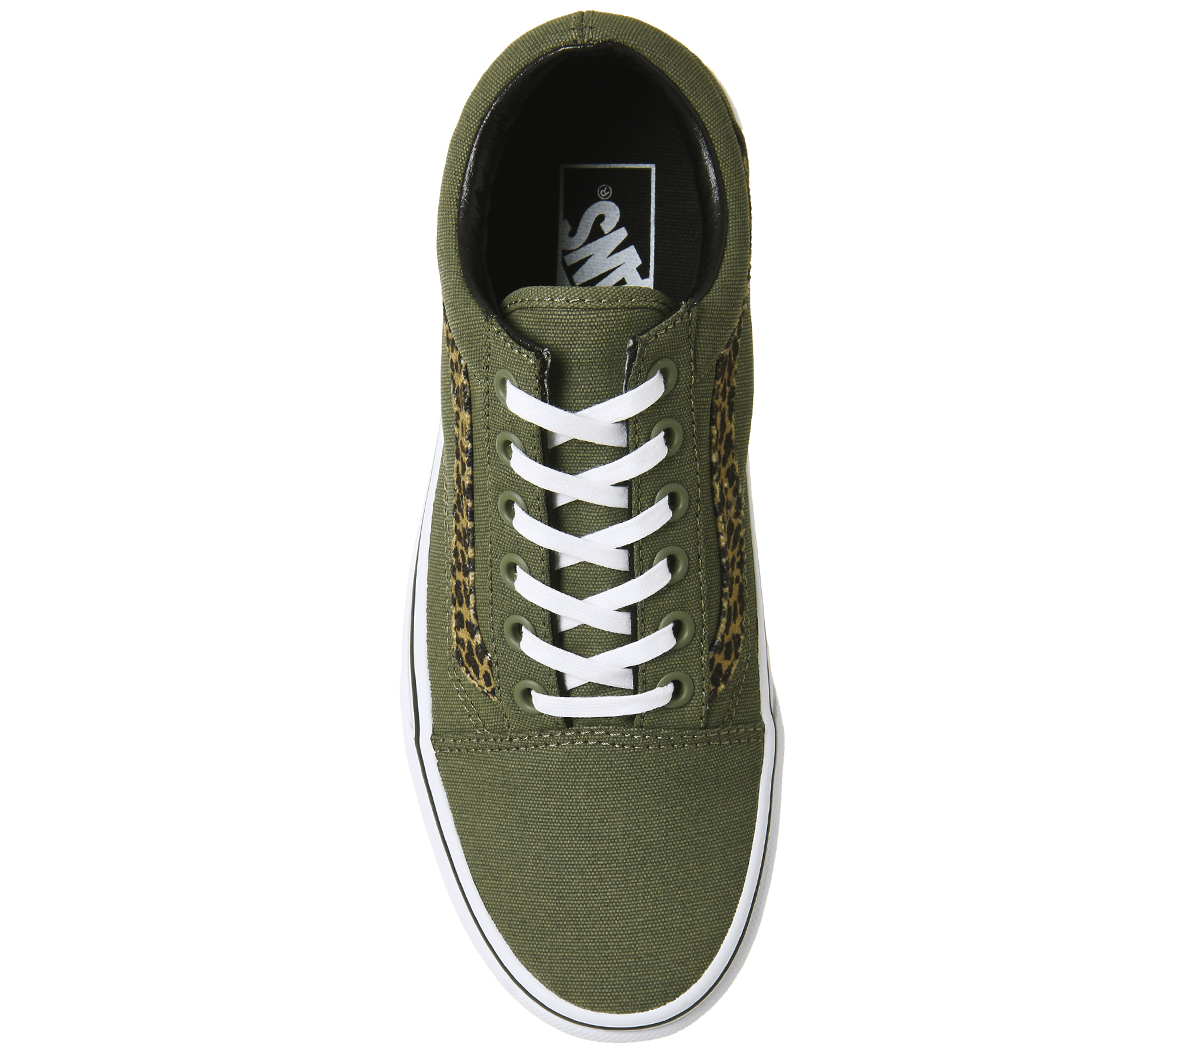 2073b3e2a0633a Womens Vans Old Skool Trainers MINI LEOPARD ARMY GREEN WHITE ...